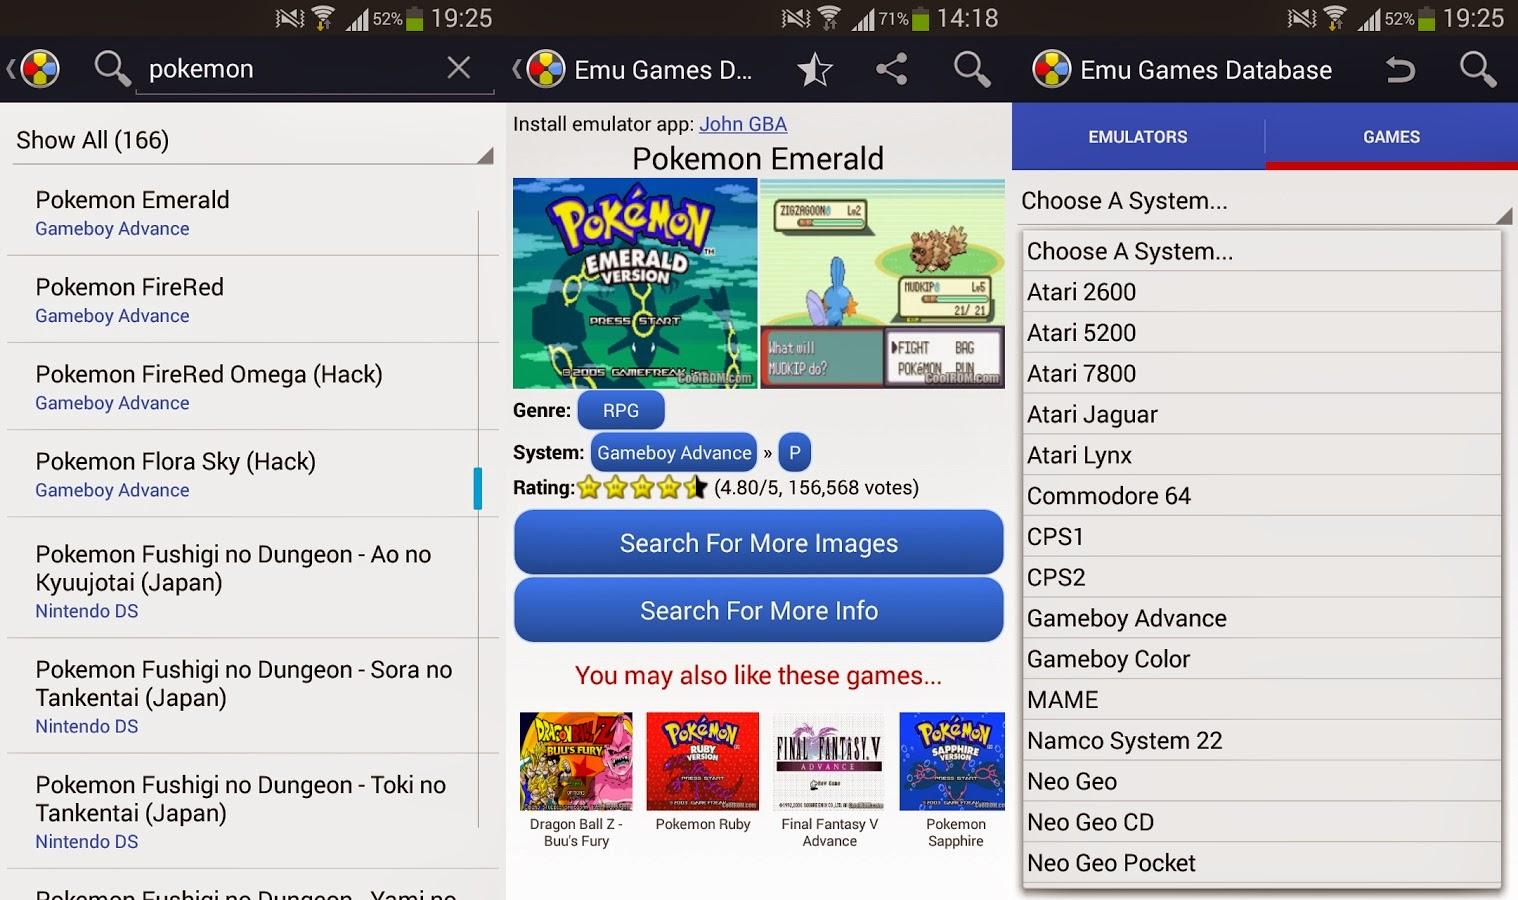 Emulator Games Database | Download APK For Free (Android Apps)